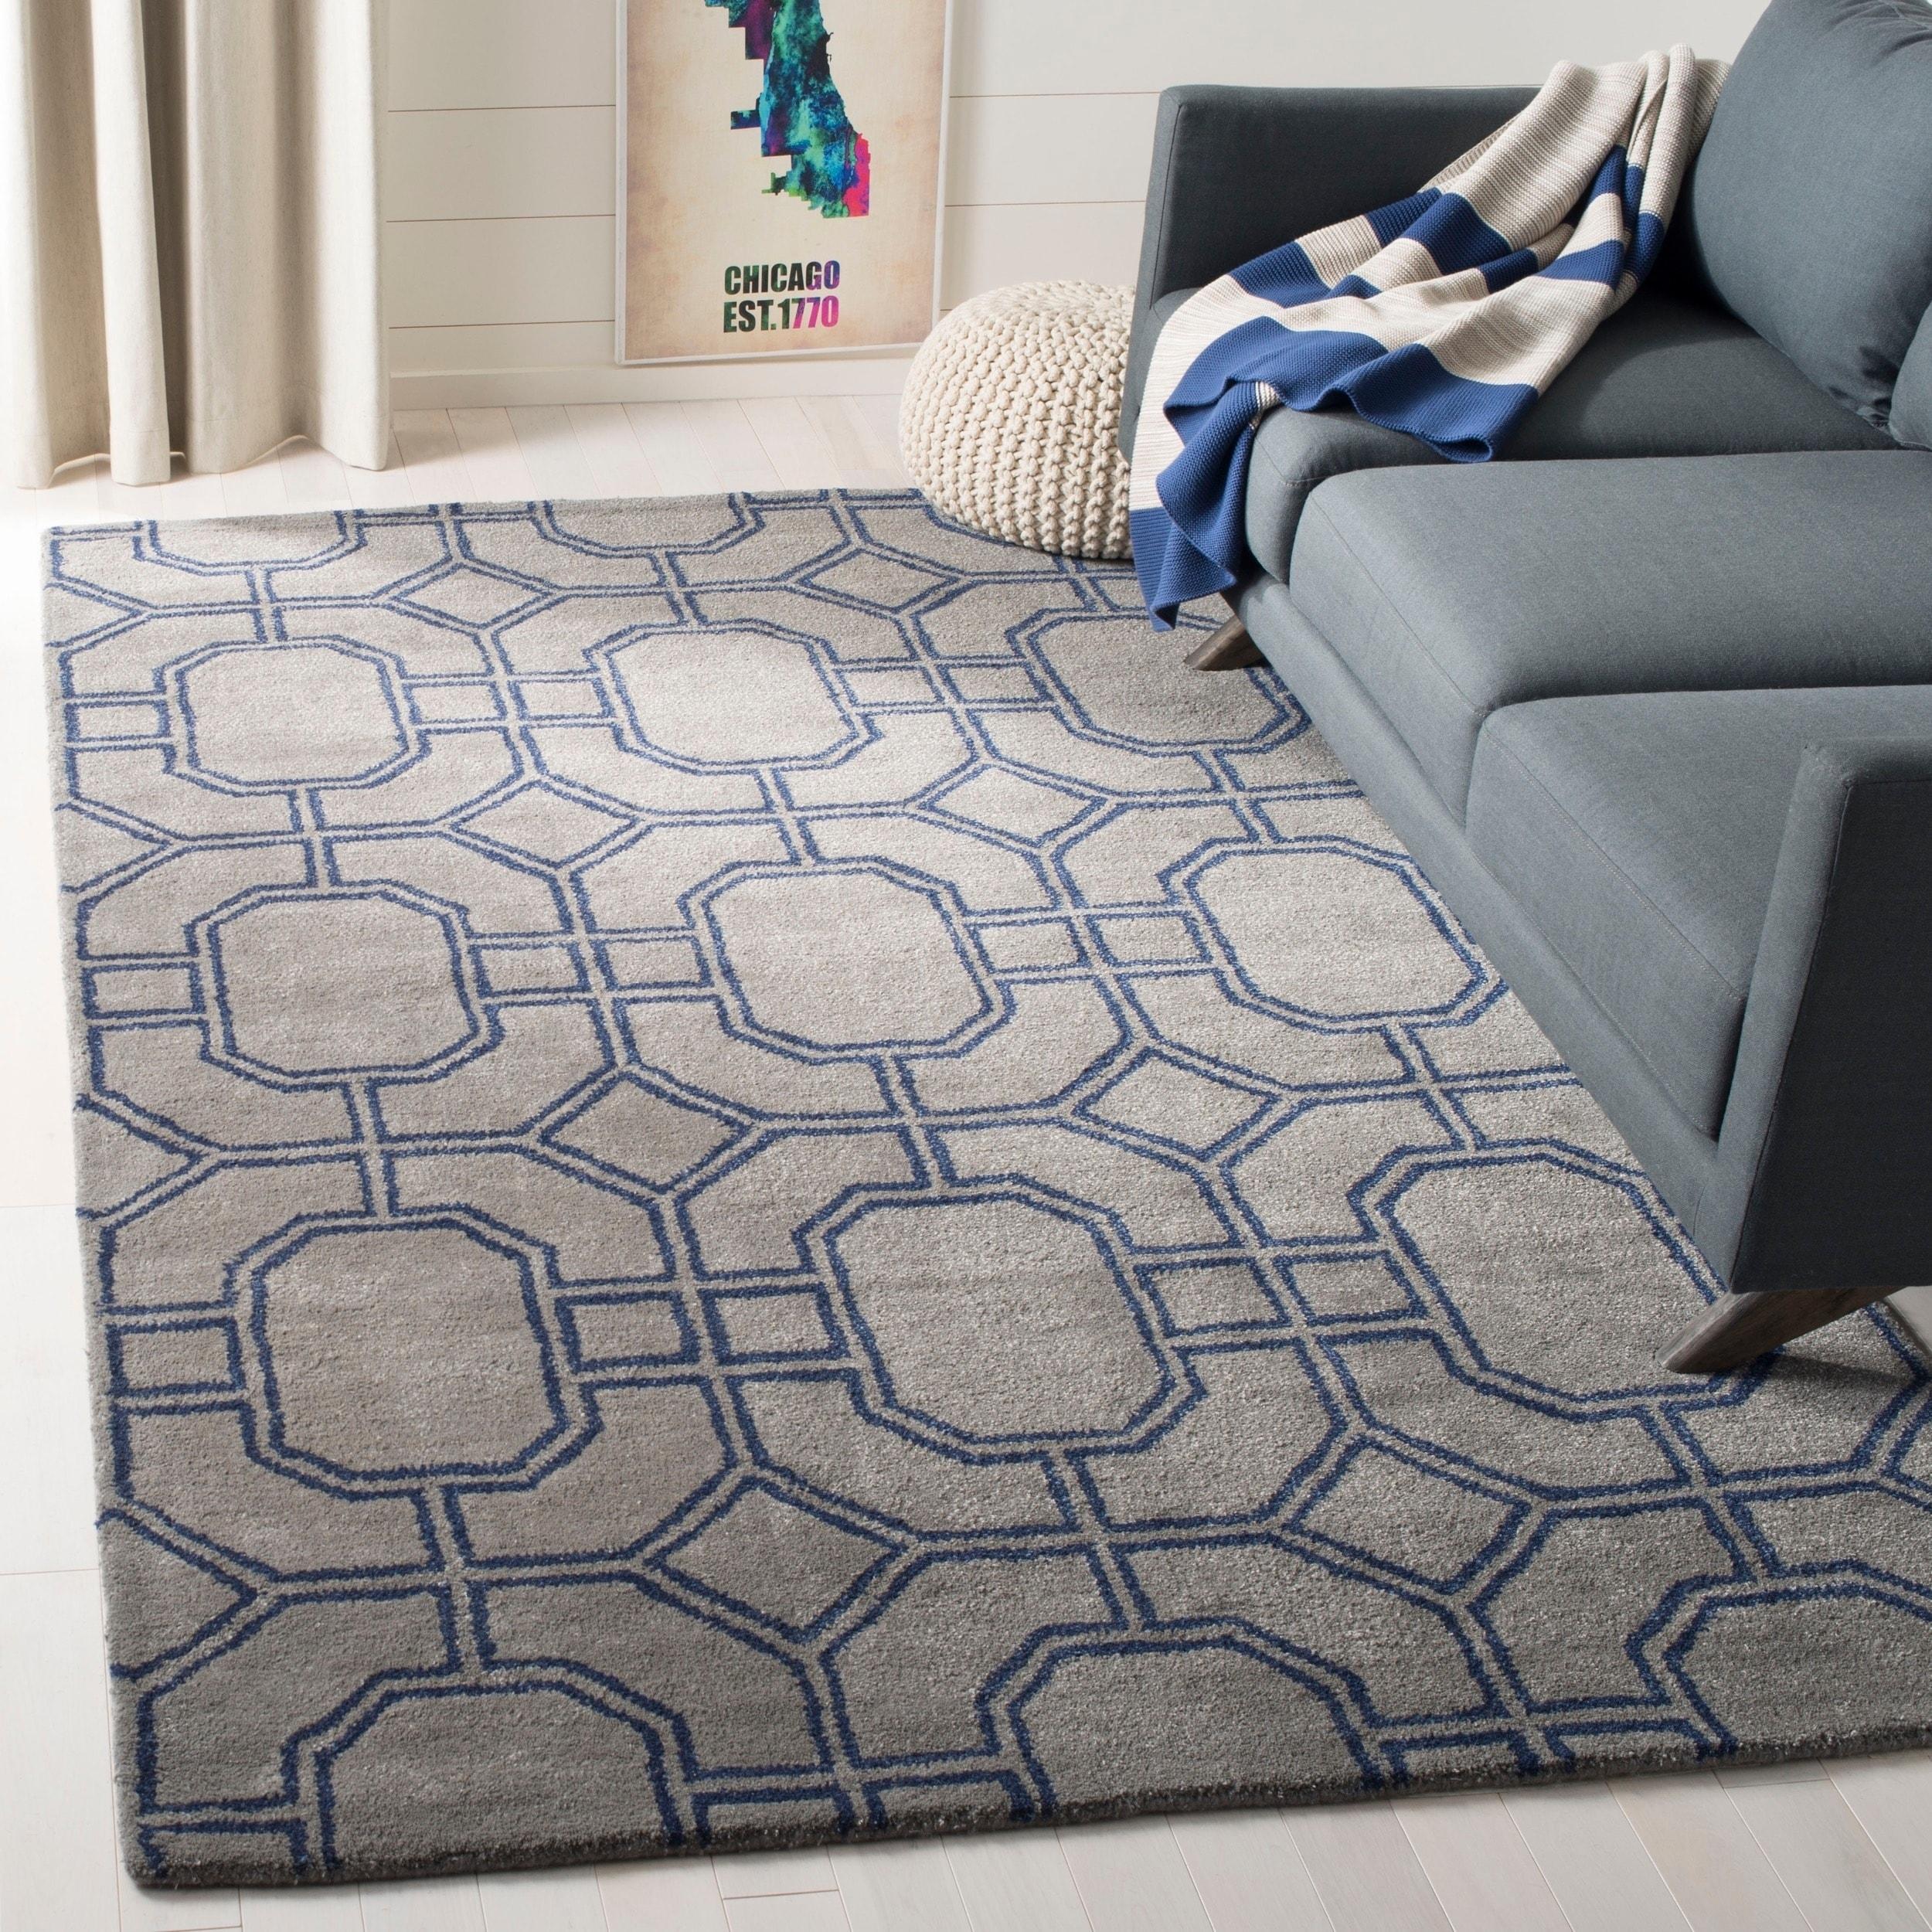 Safavieh handmade soho grey dark blue new zealand wool viscose rug 5 x 8